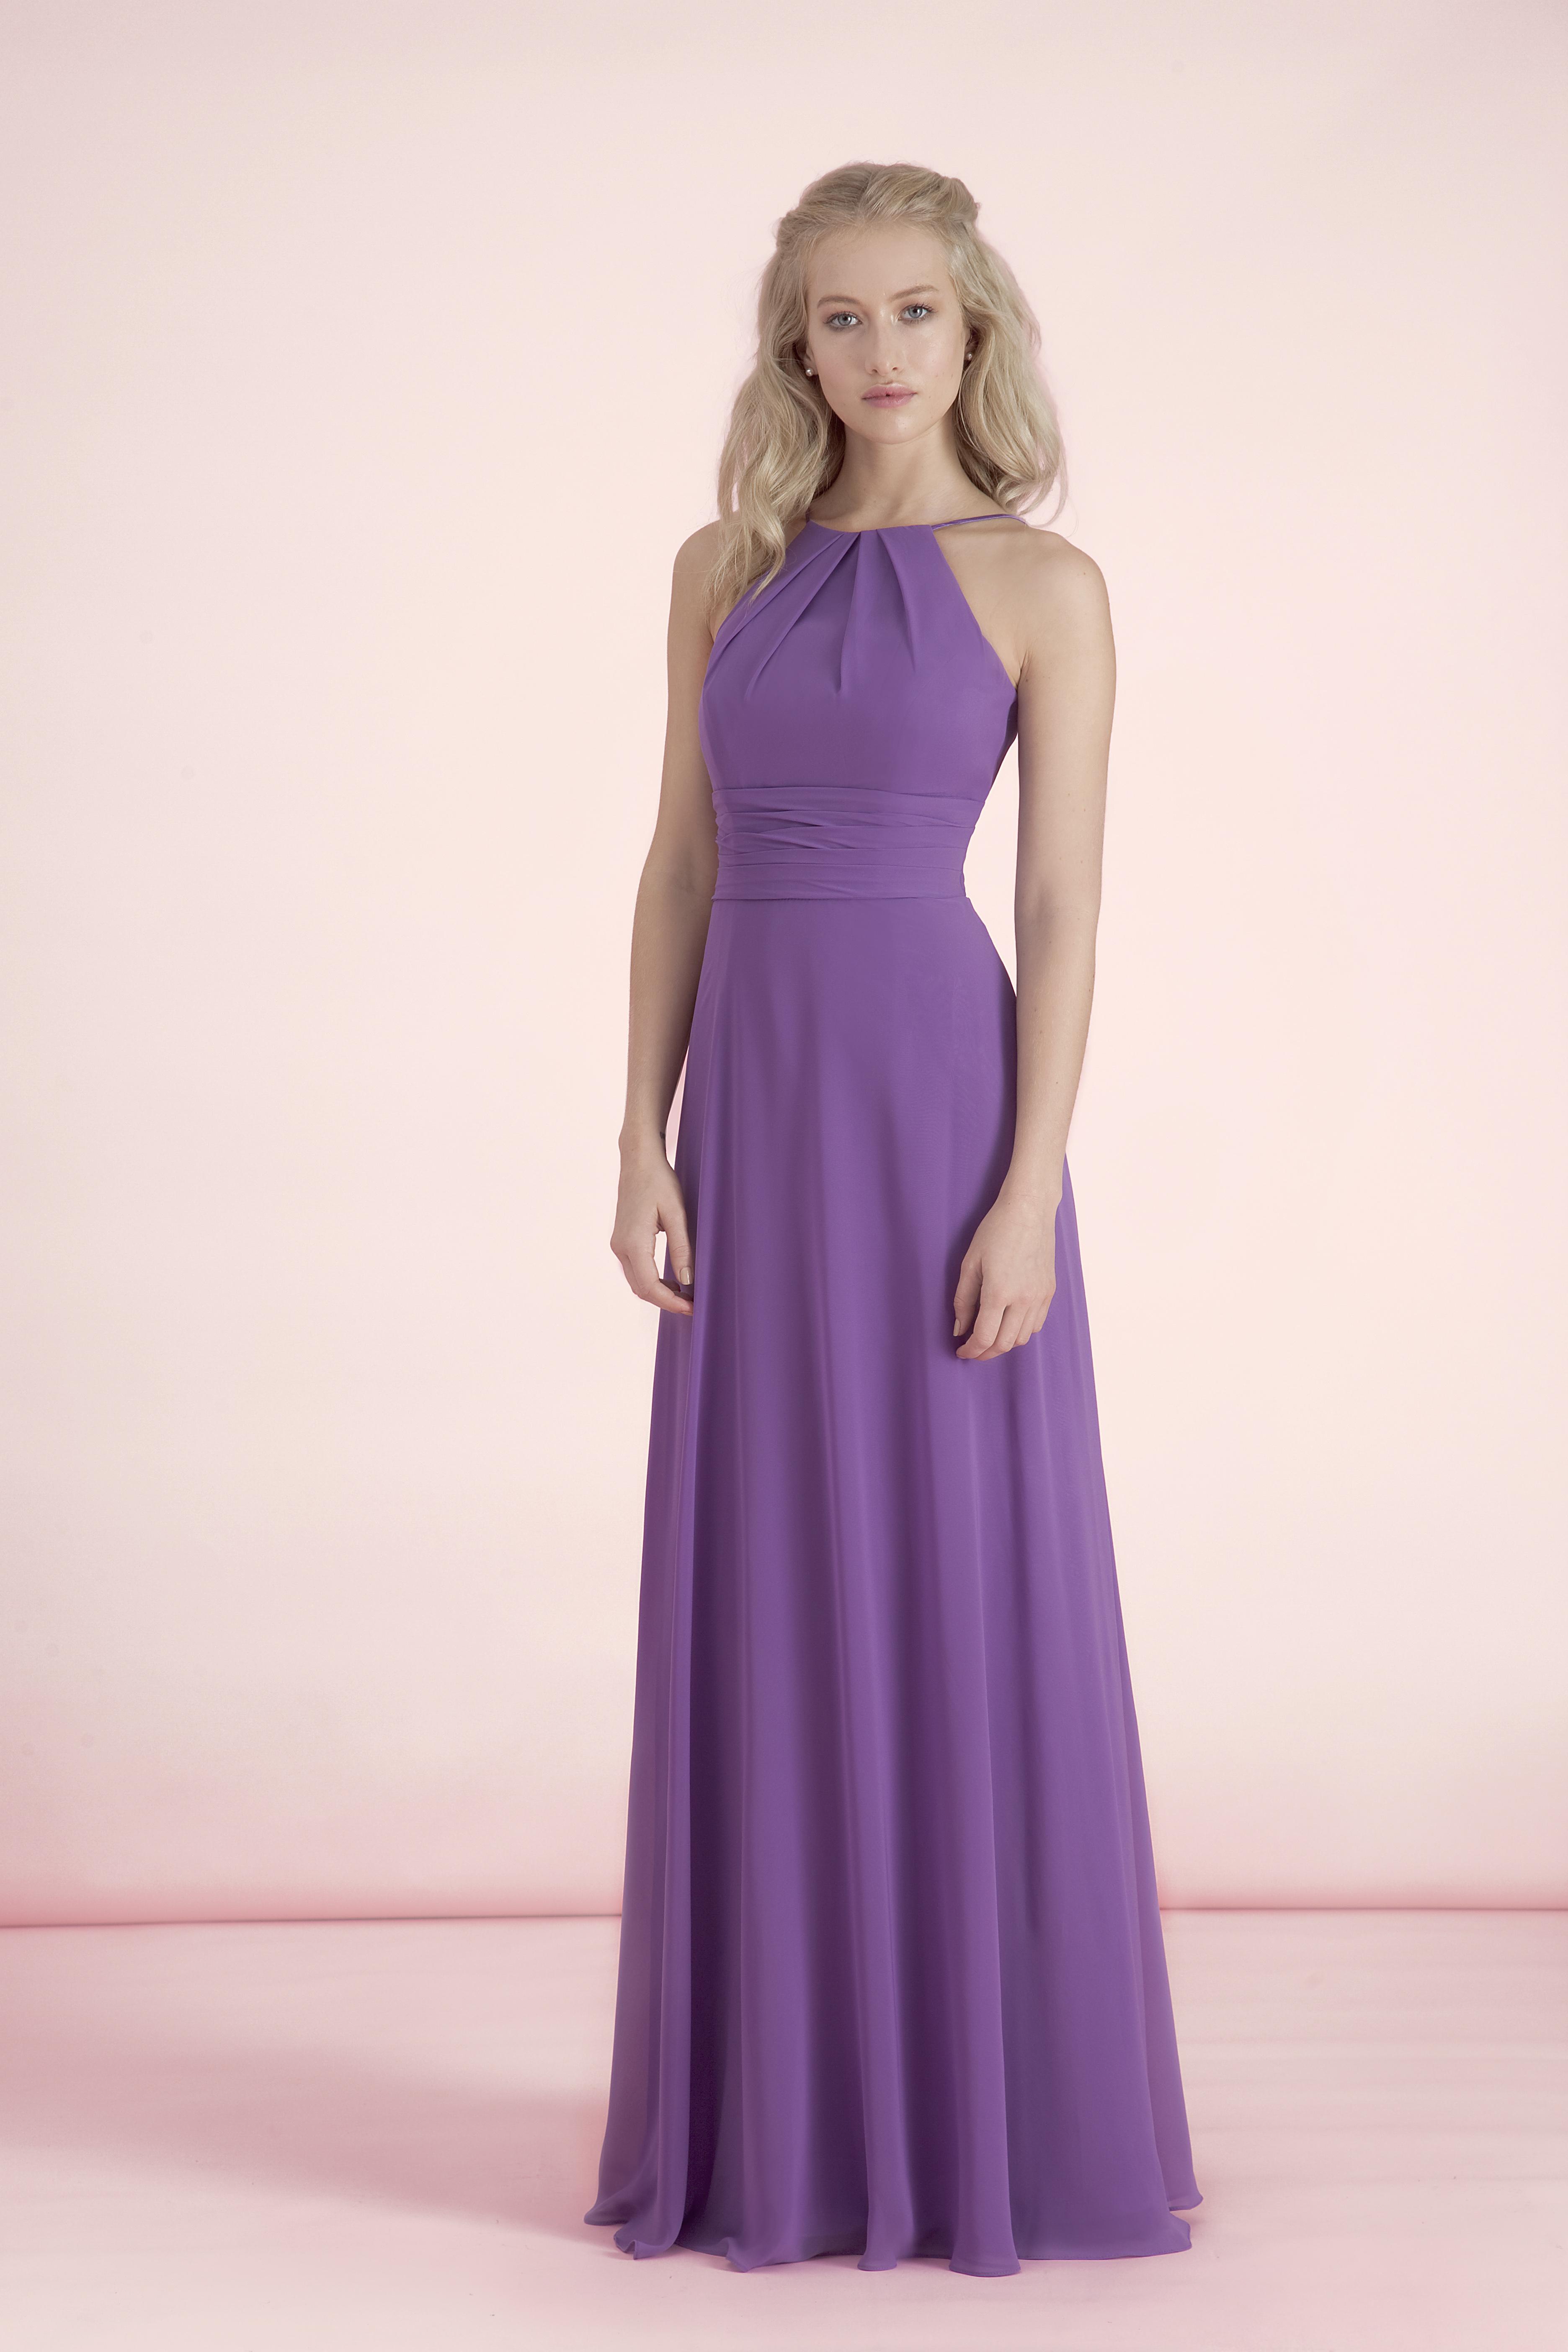 Kelsey Rose – Amelia\'s Bridal Boutique – Wedding Gowns | Bridesmaids ...